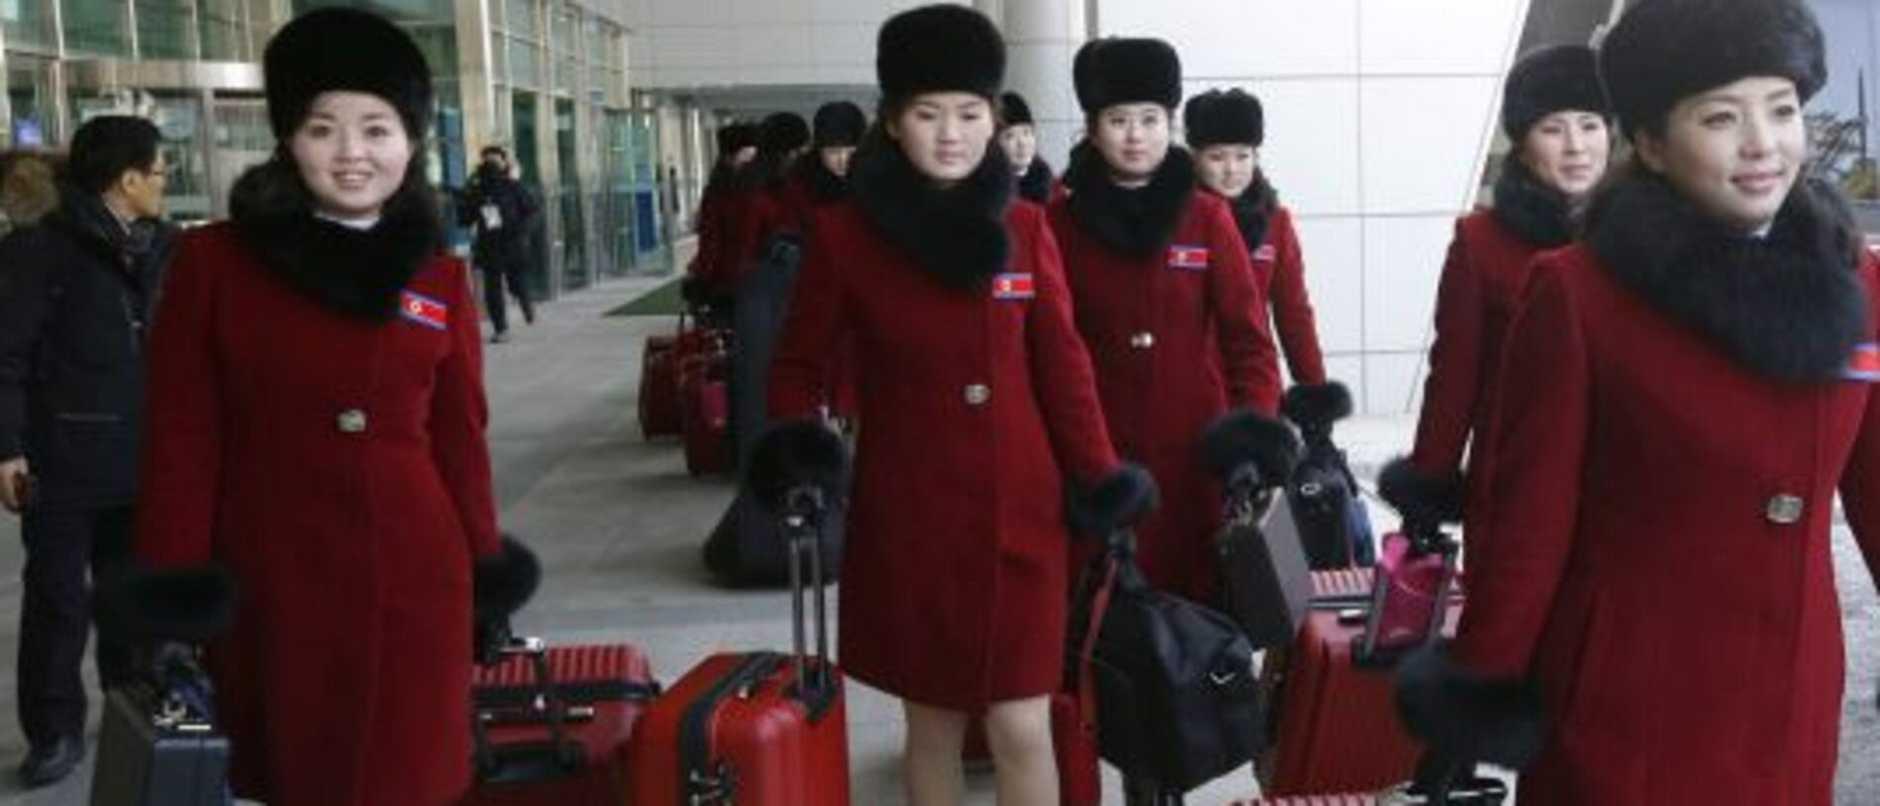 Kim Jong Un train story